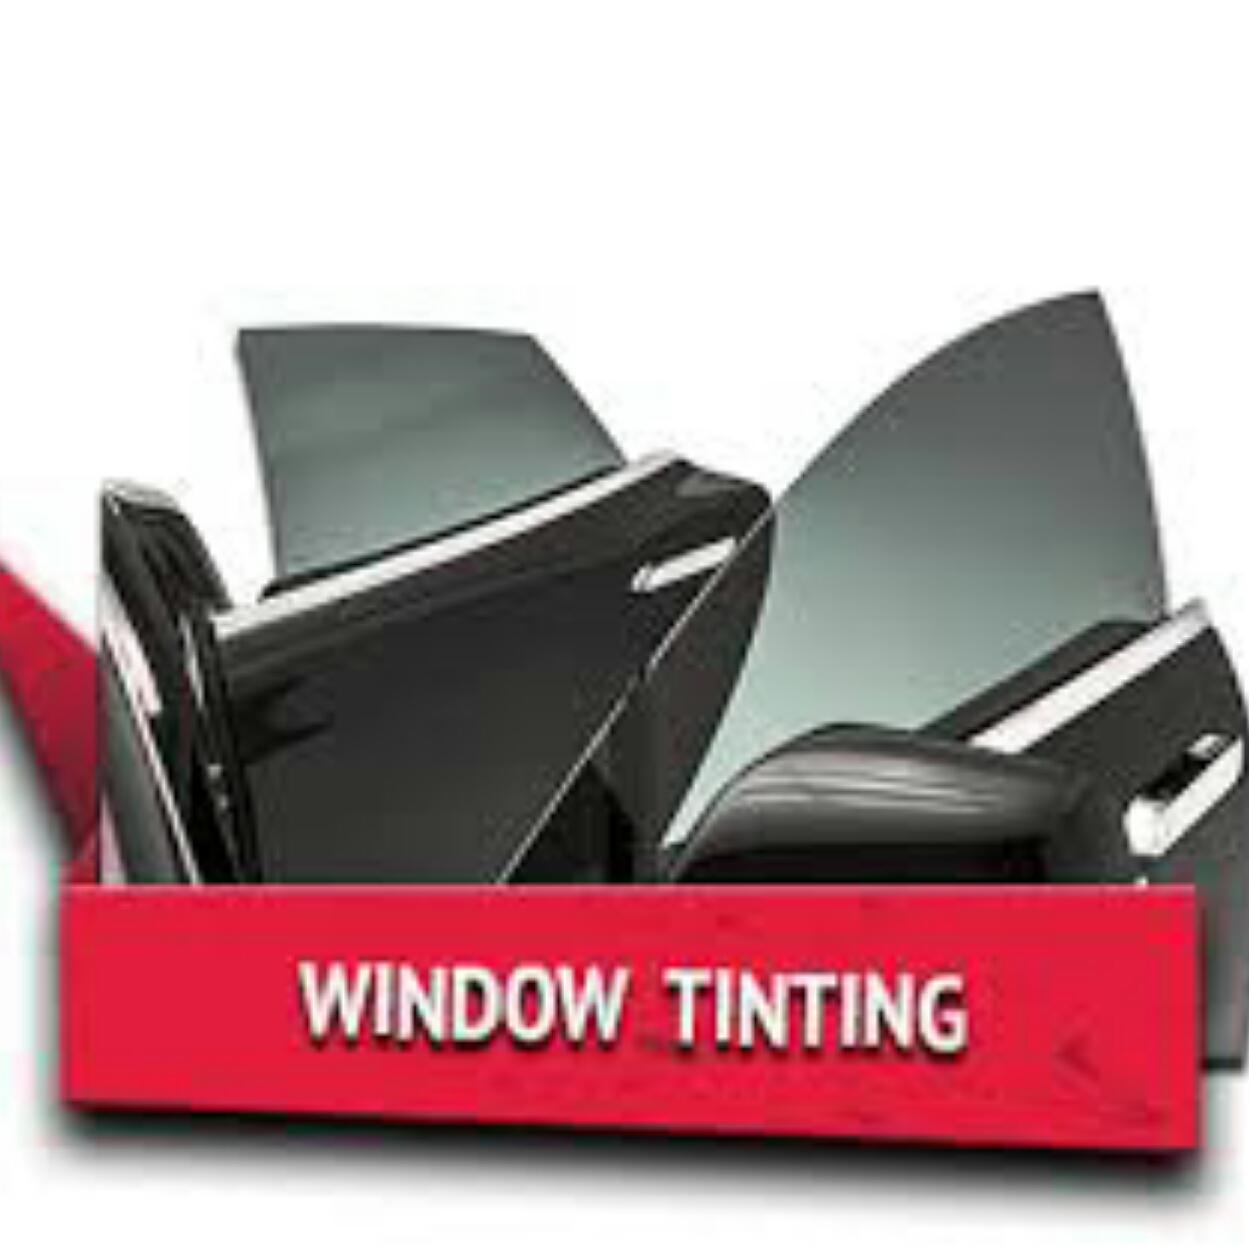 Massive Mobile Window Tinting